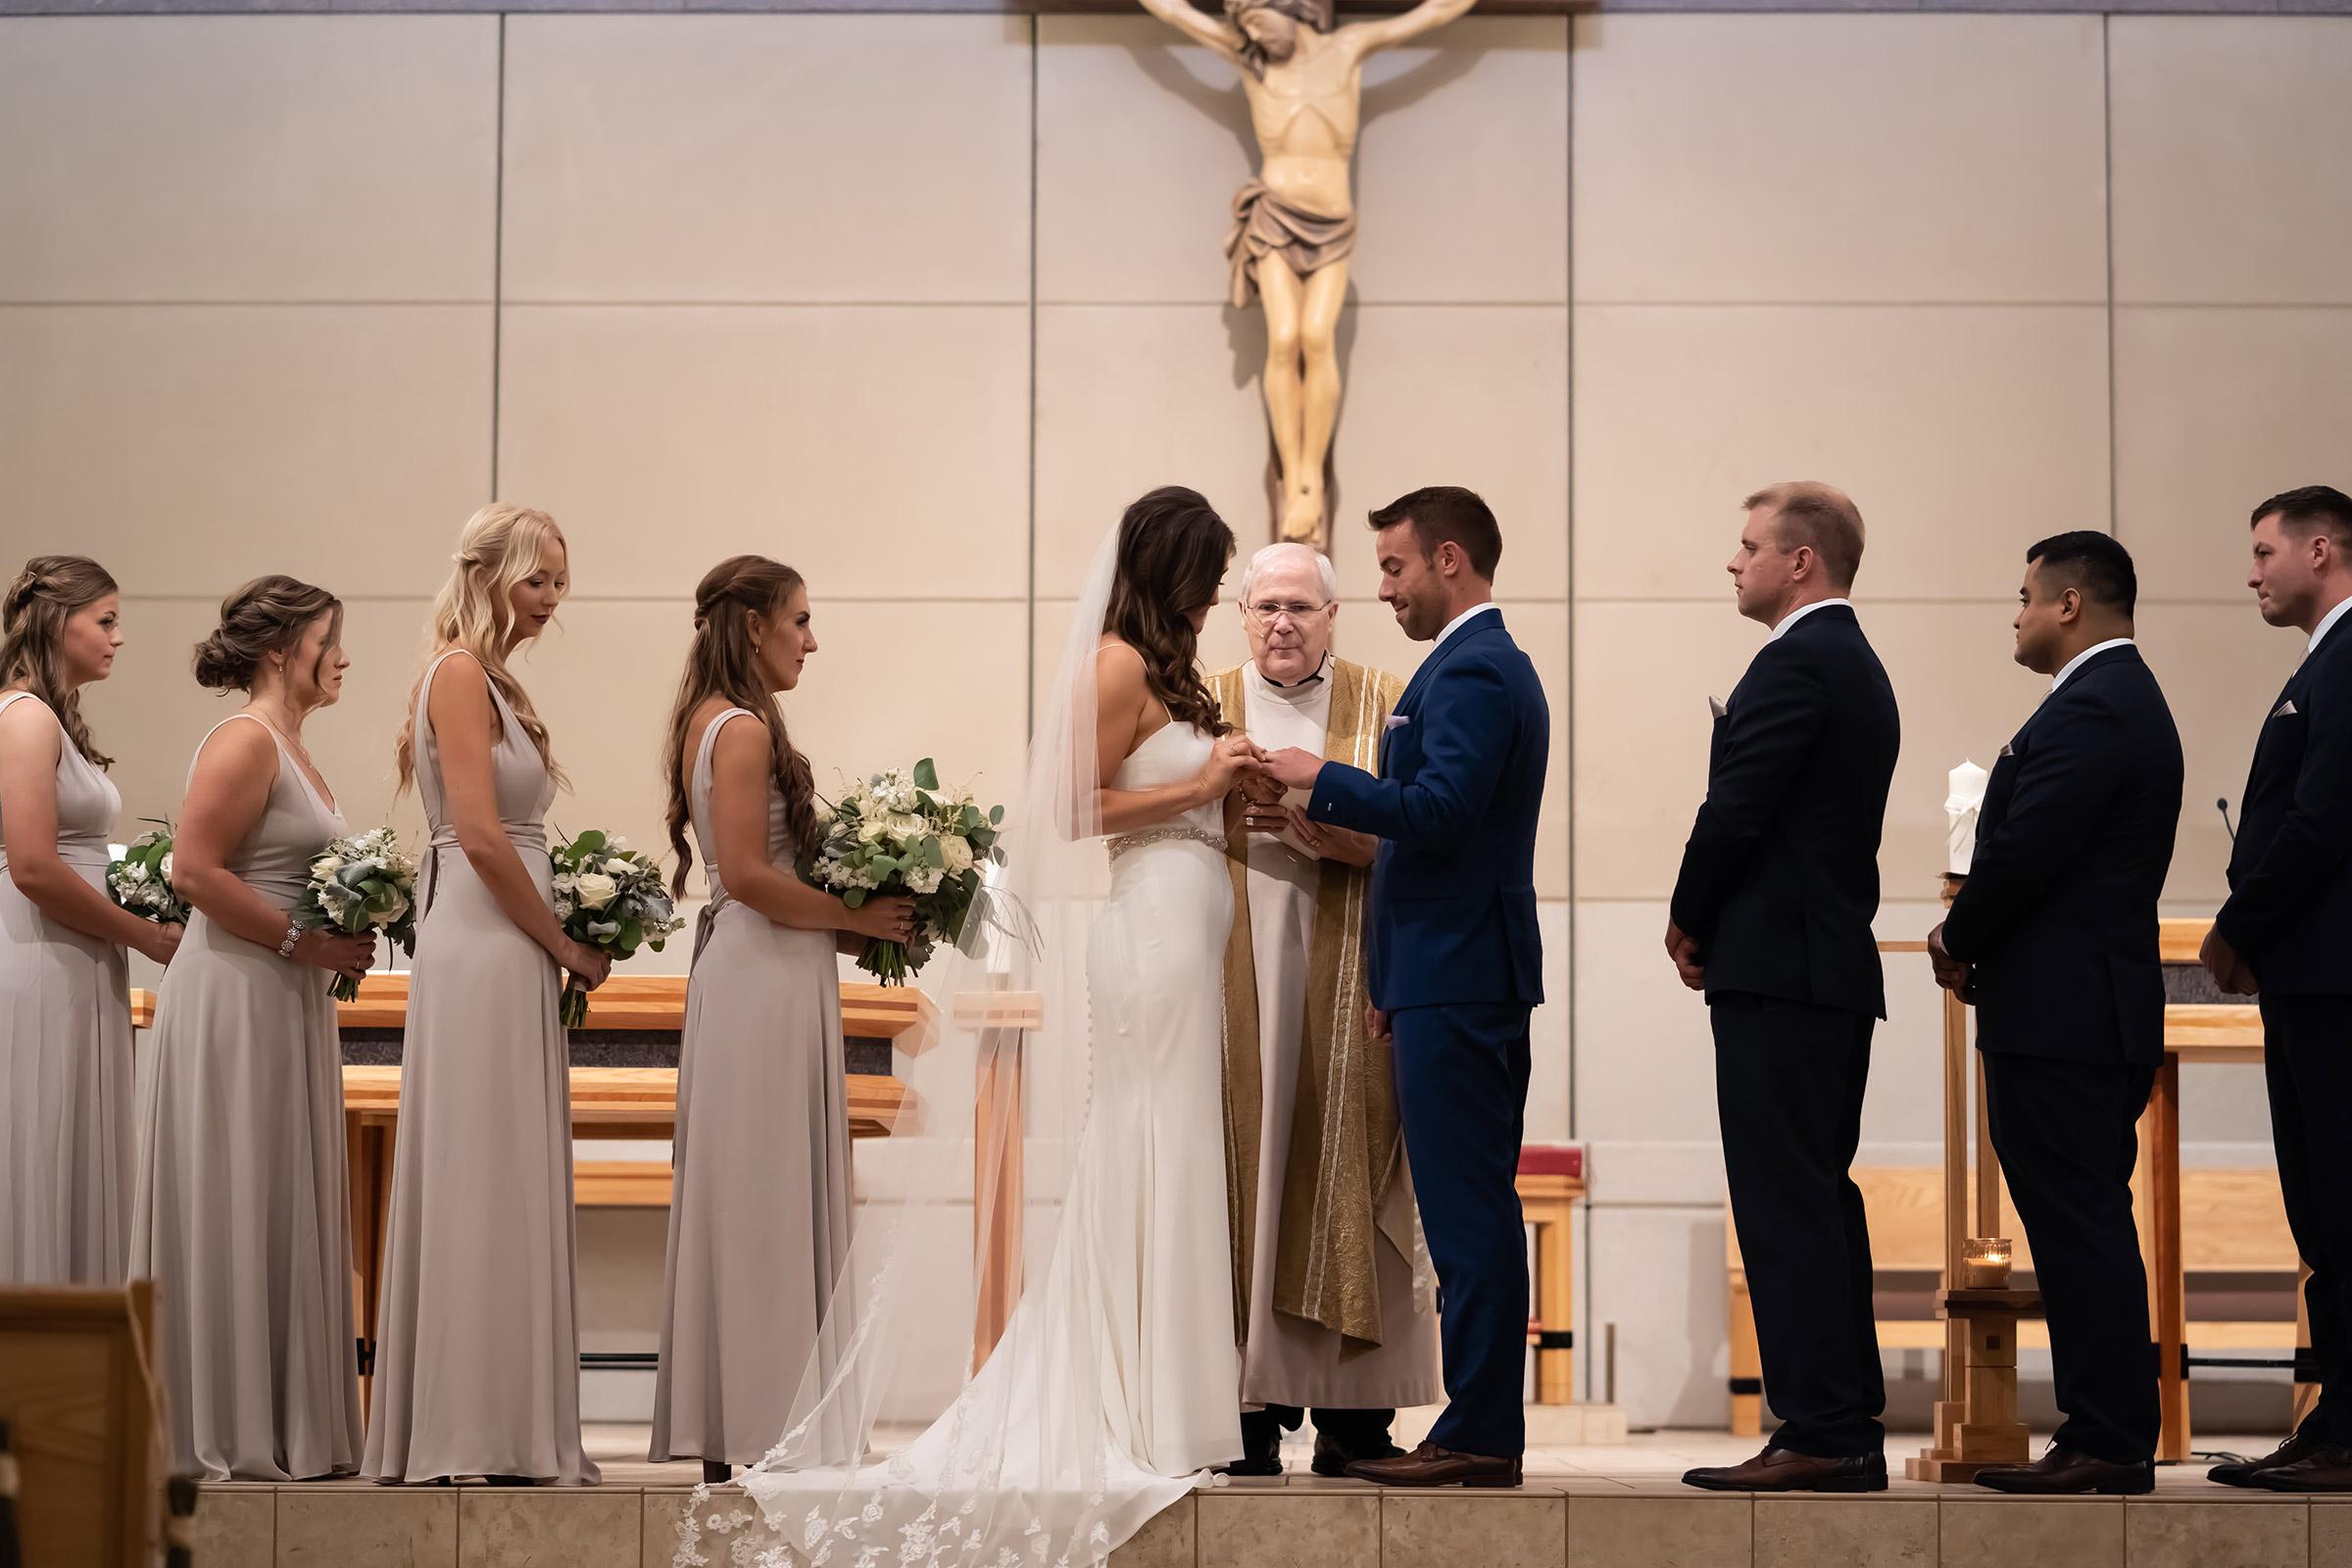 mr-mrs-hull-bride-putting-ring-on-groom-ceremony-st-boniface-church-waukee-desmoines-iowa-raelyn-ramey-photography-335.jpg